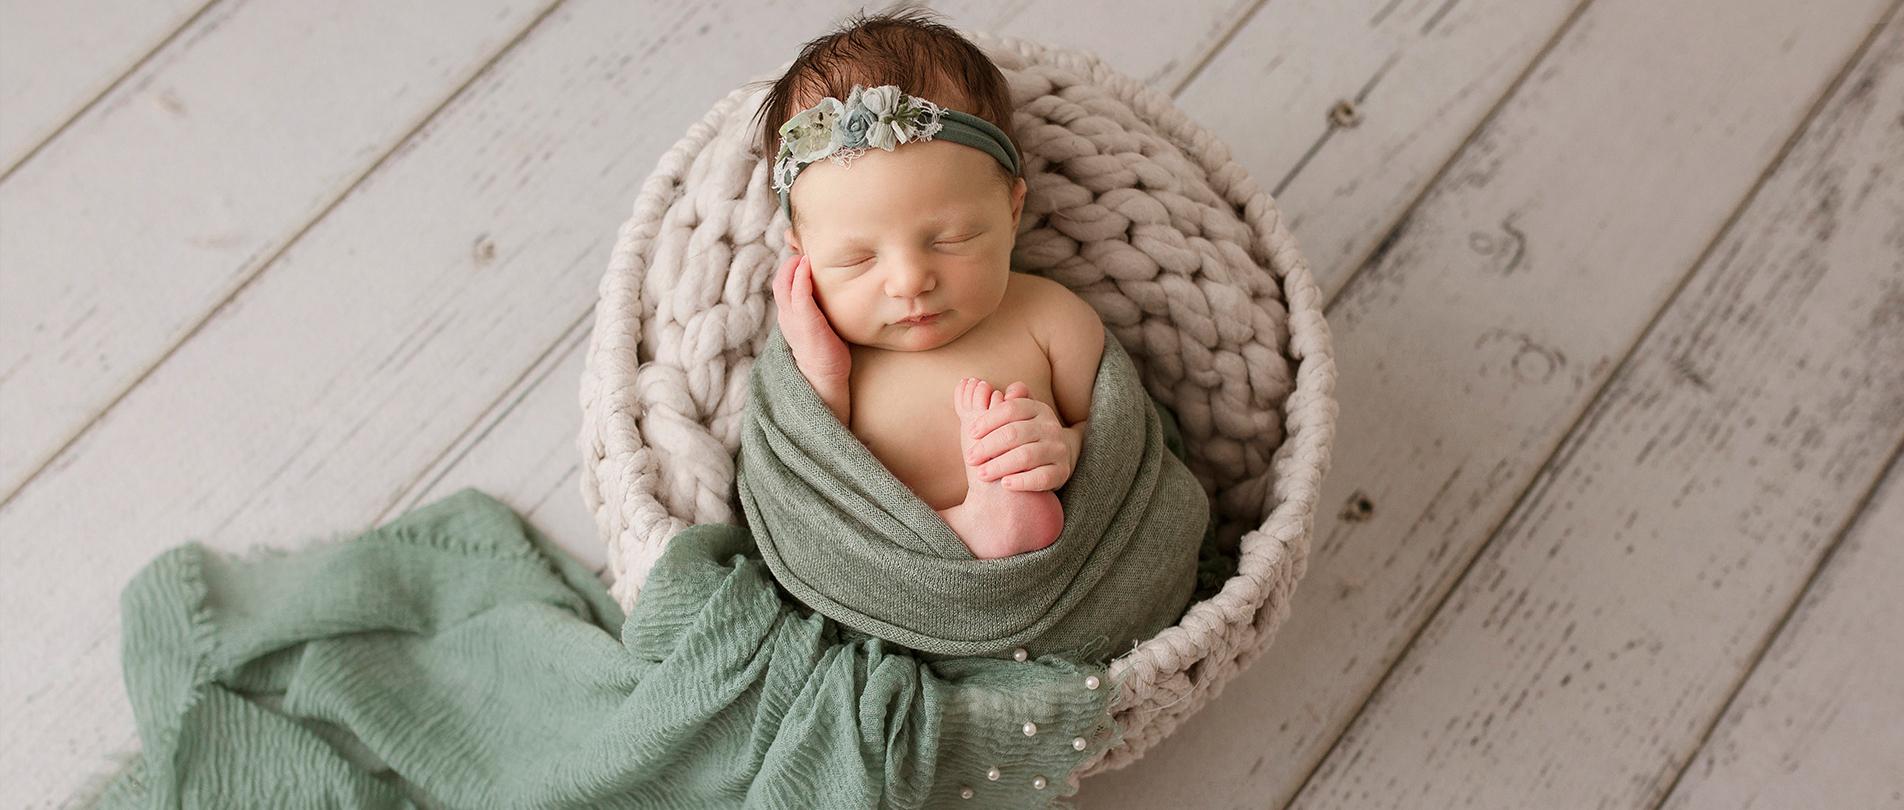 metro detroit newborn photographer brighton howell ann arbor 2020